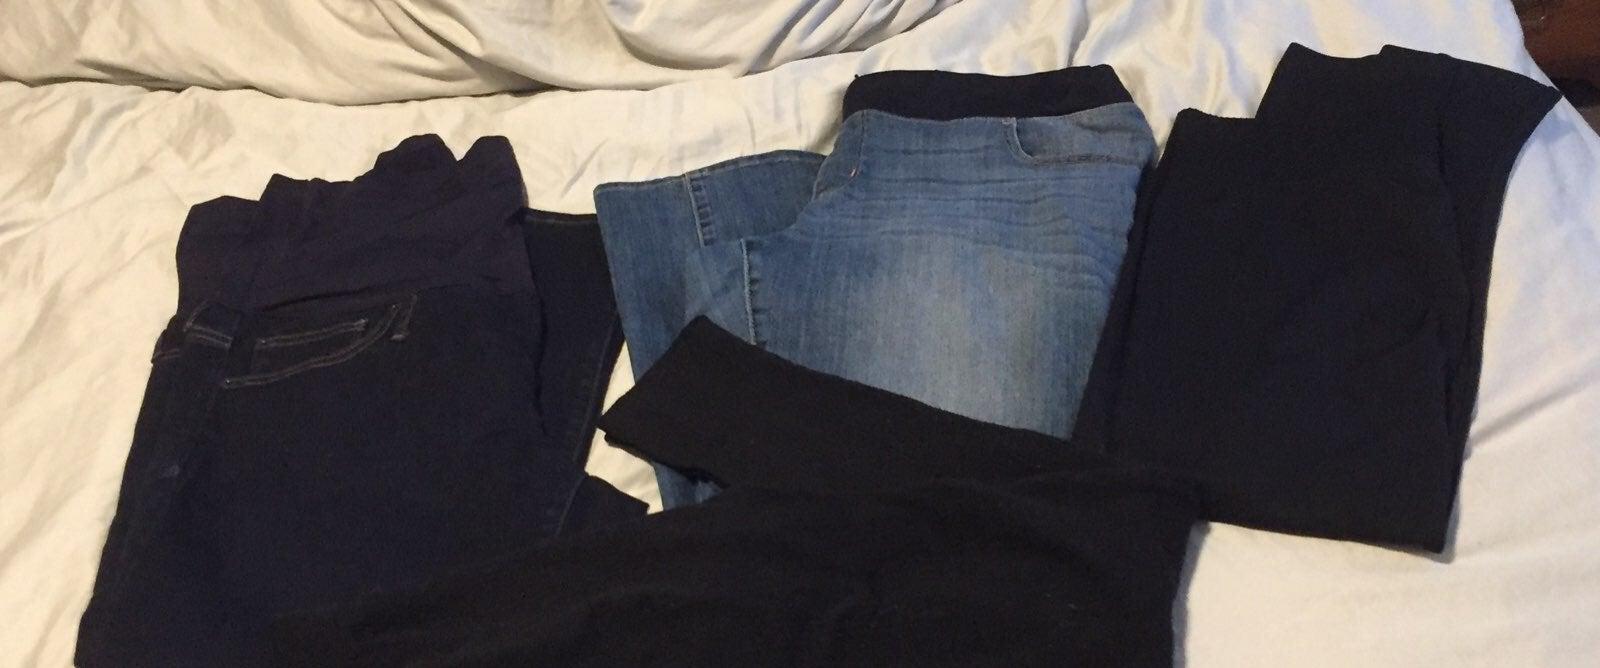 maternity pants lot 2jeans 2leggings